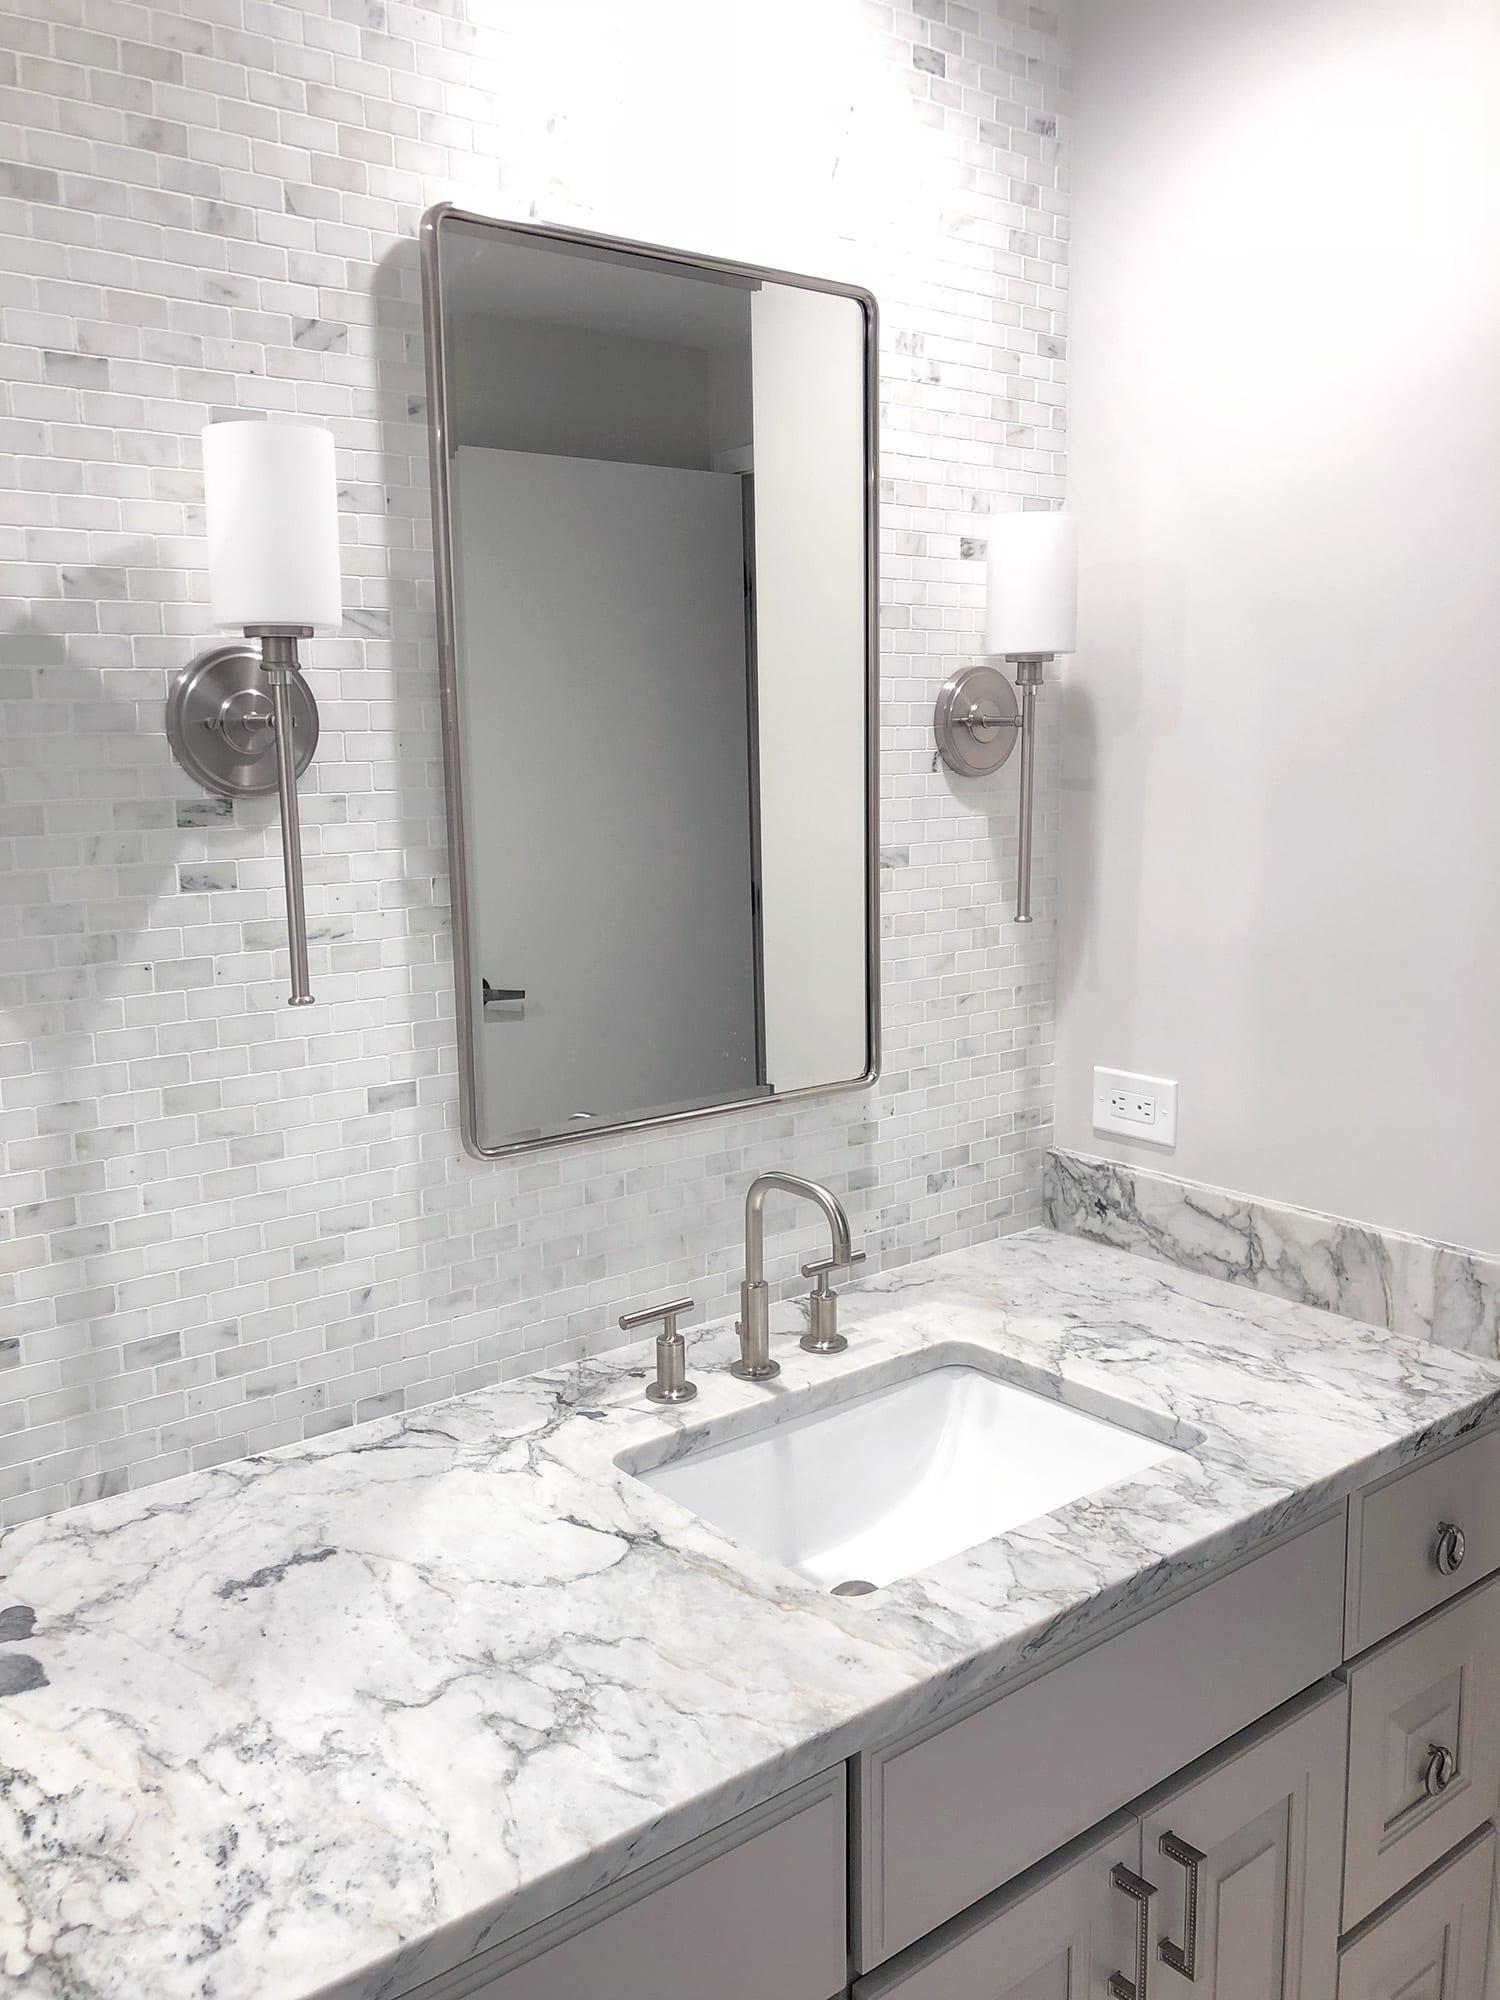 White Arabesque Counters Amp Olympian White Mosaic Tile Stone City Kitchen Amp Bath Design